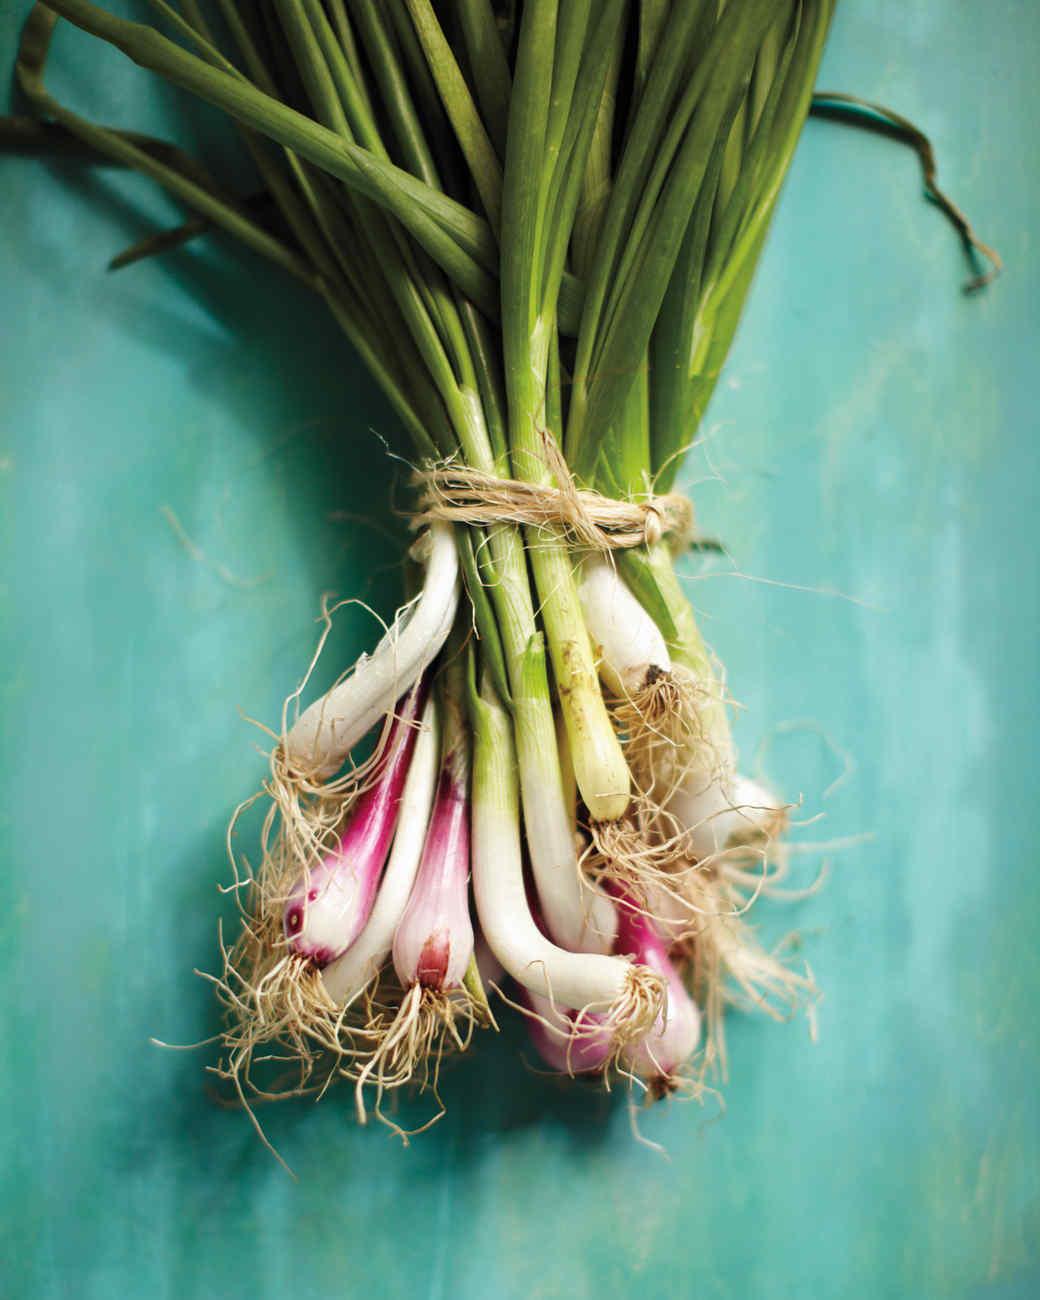 spring-onions-mld107571.jpg